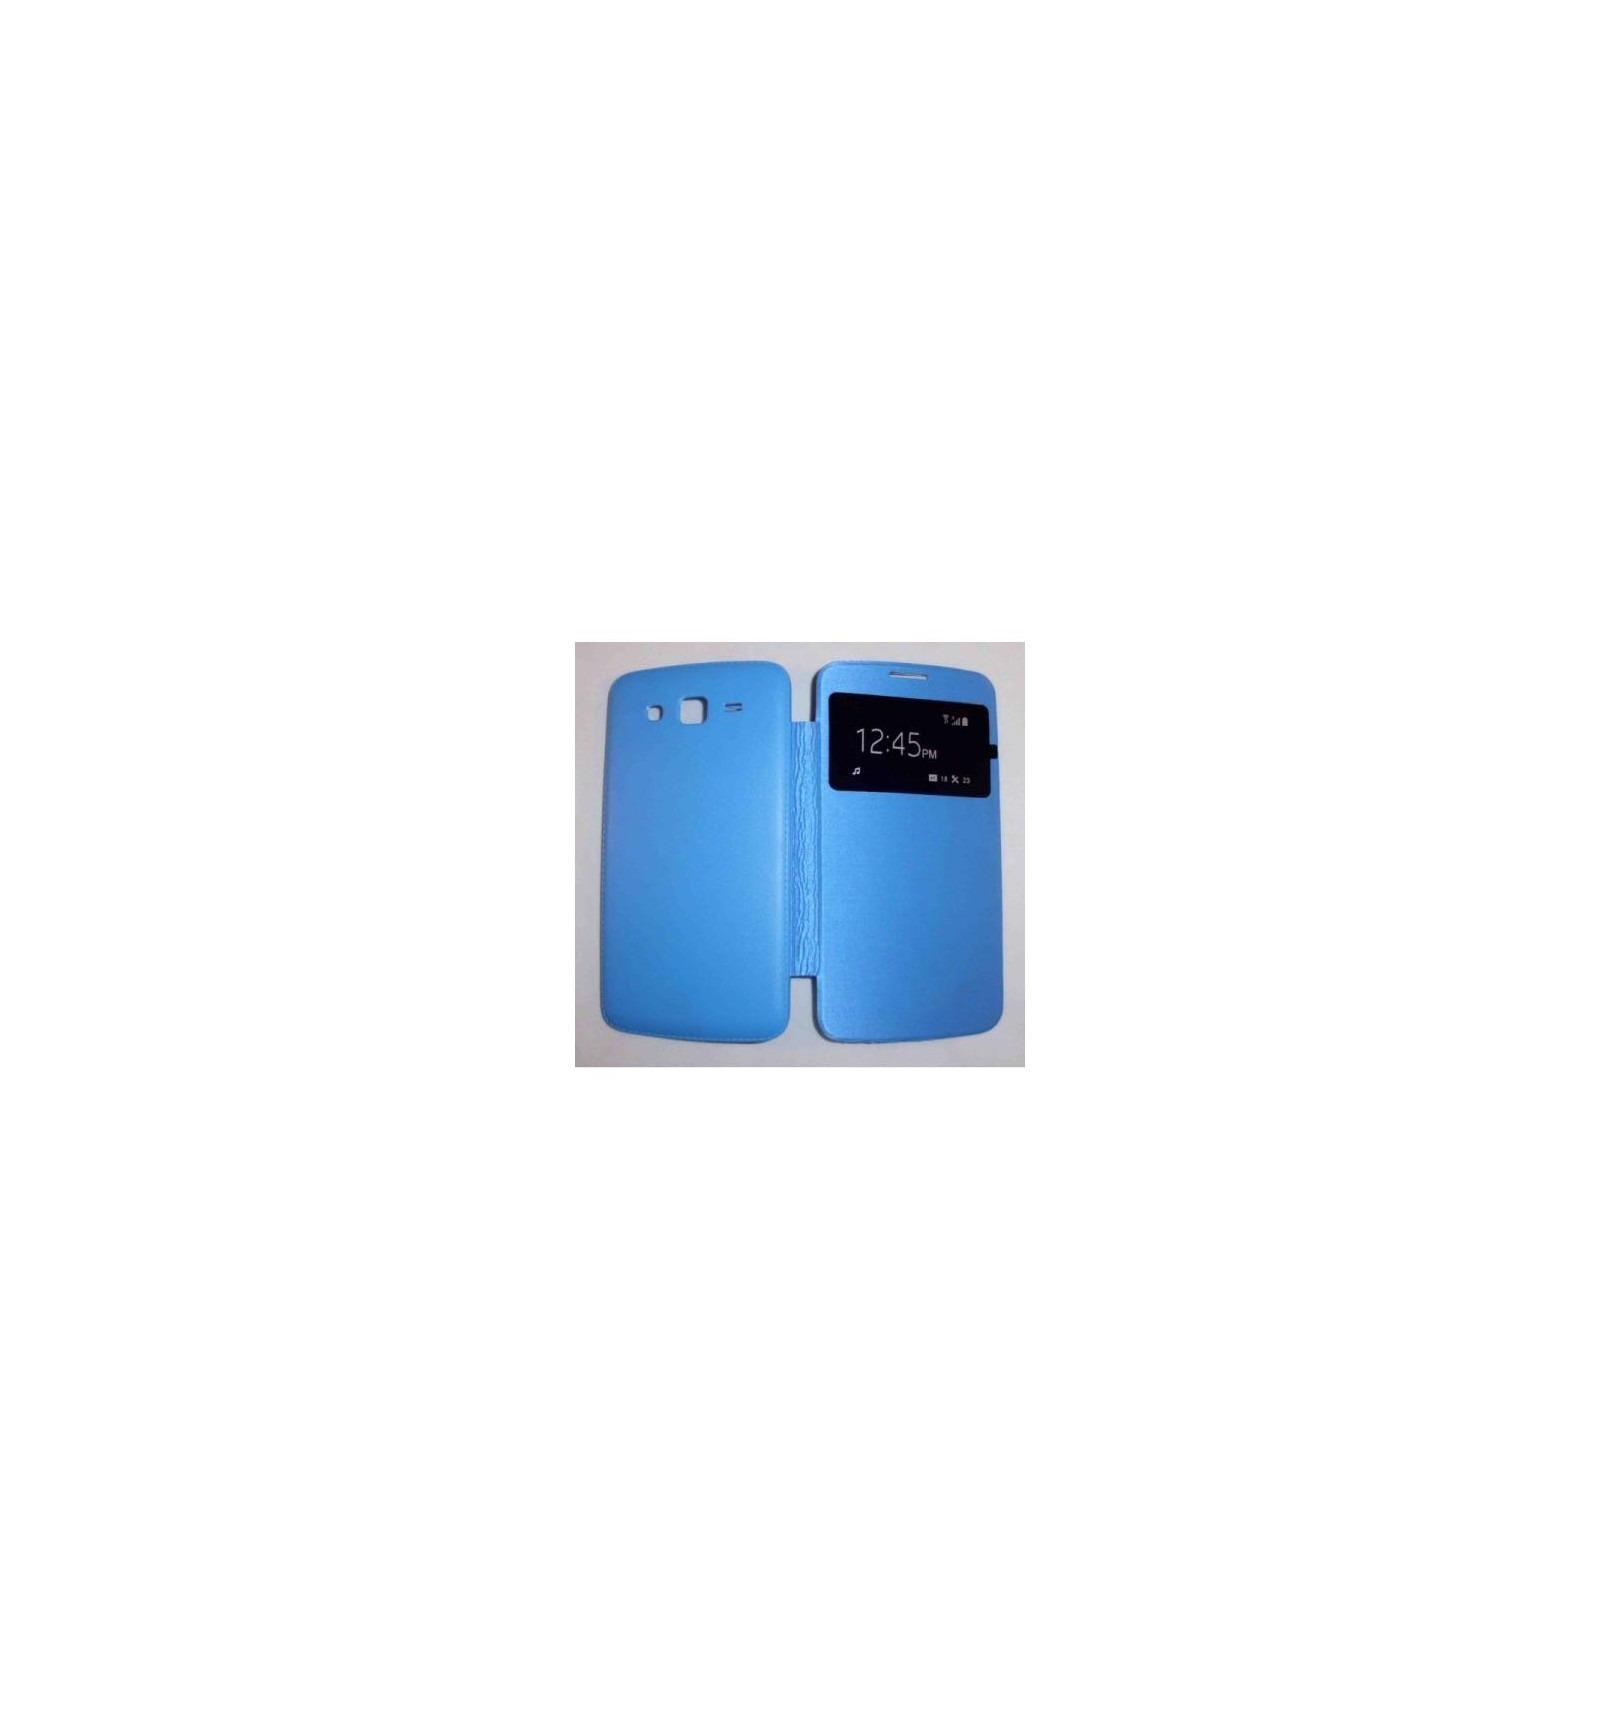 Funda inteligente s view cover azul celeste samsung galaxy g - Comprar funda samsung galaxy s ...